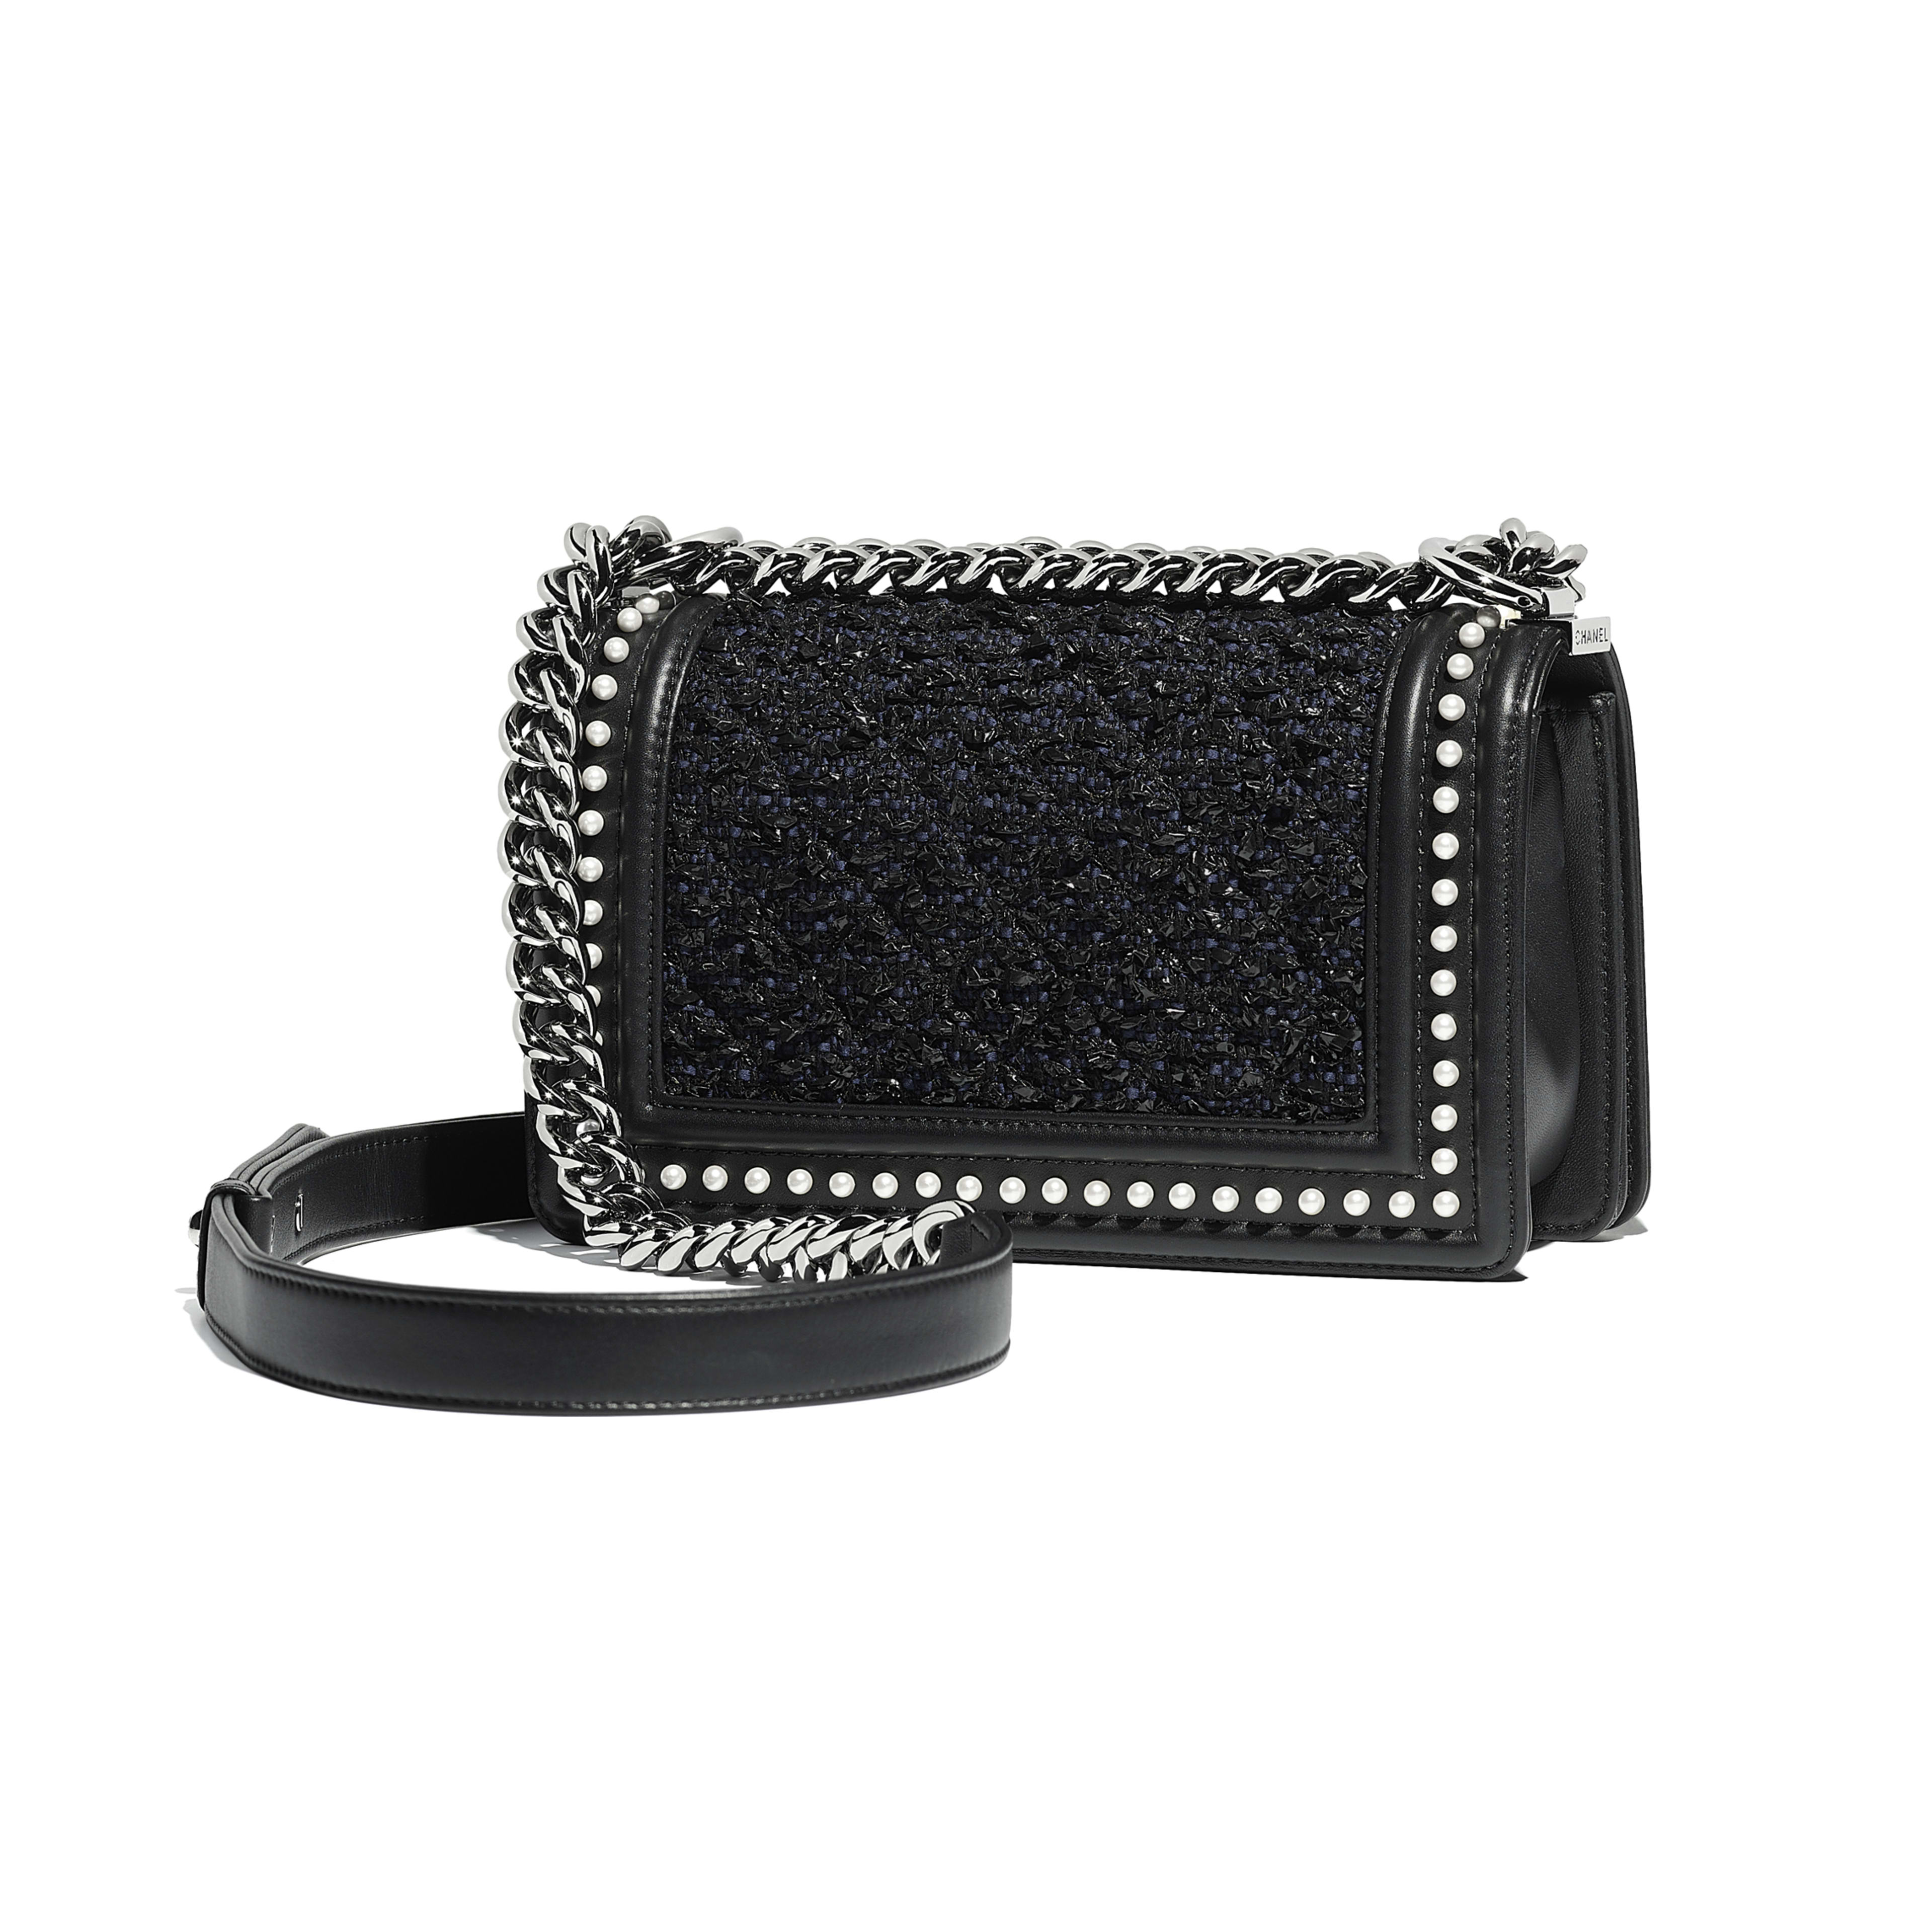 Small BOY CHANEL Handbag - Black & Navy Blue - Tweed, Calfskin, Imitation Pearls & Ruthenium-Finish Metal - Alternative view - see full sized version